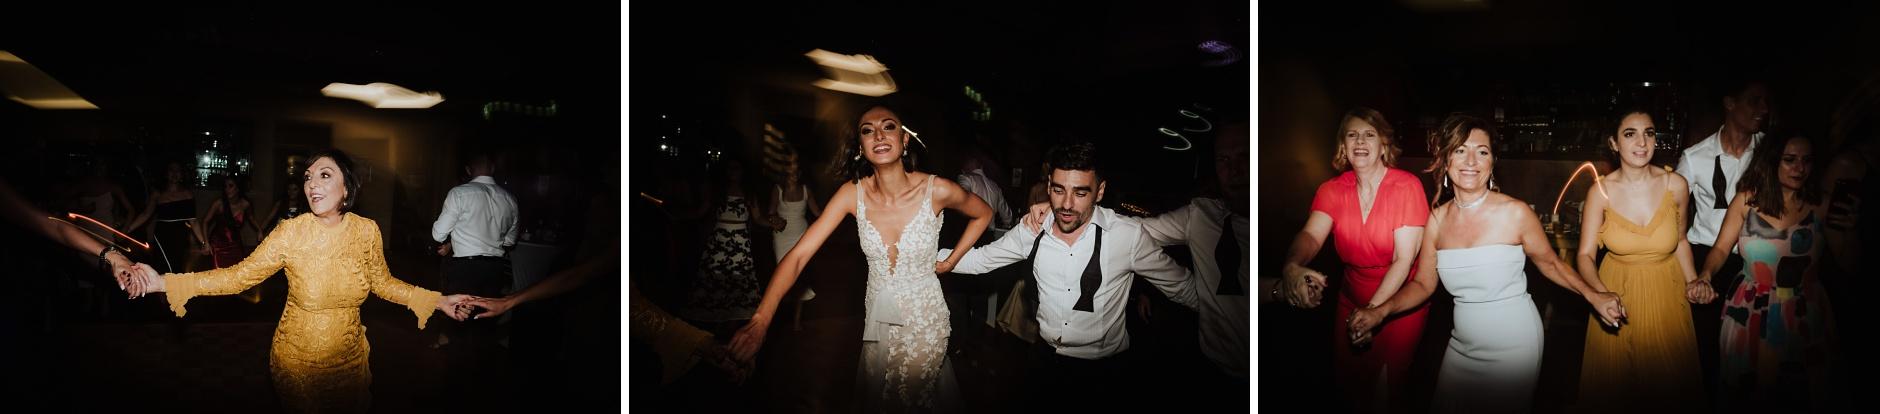 Sydney-Wedding-Photographer_0187.jpg